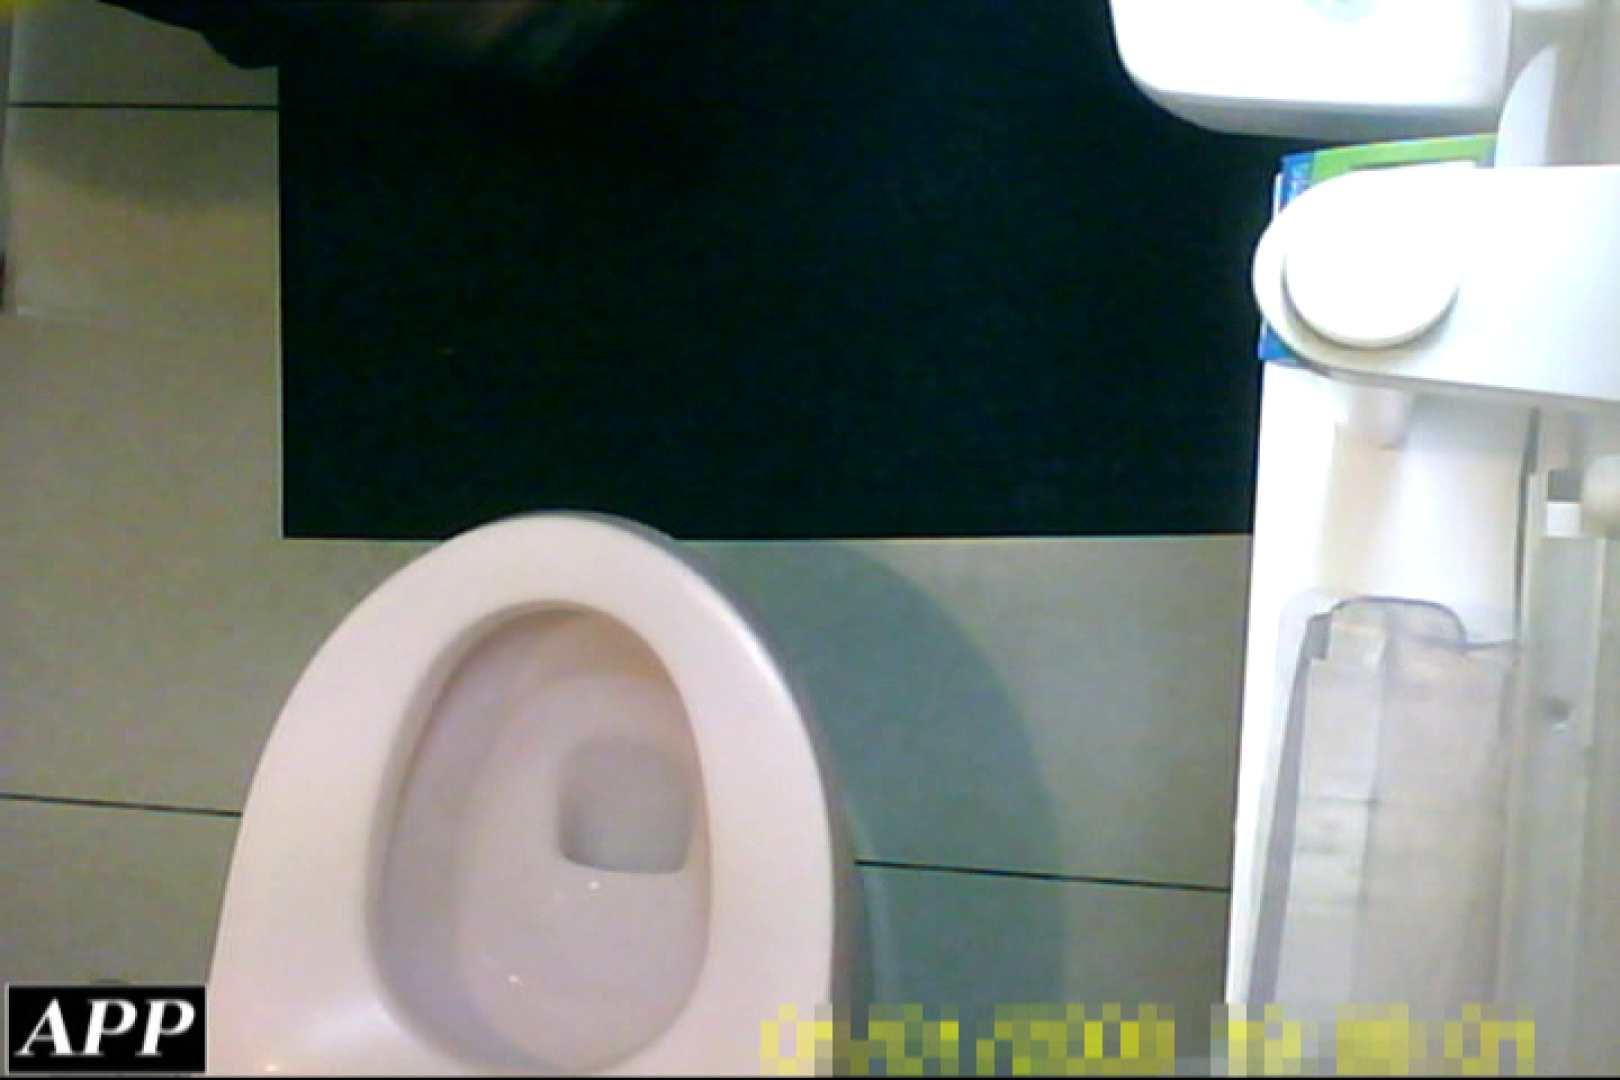 3視点洗面所 vol.57 OLハメ撮り  76Pix 67